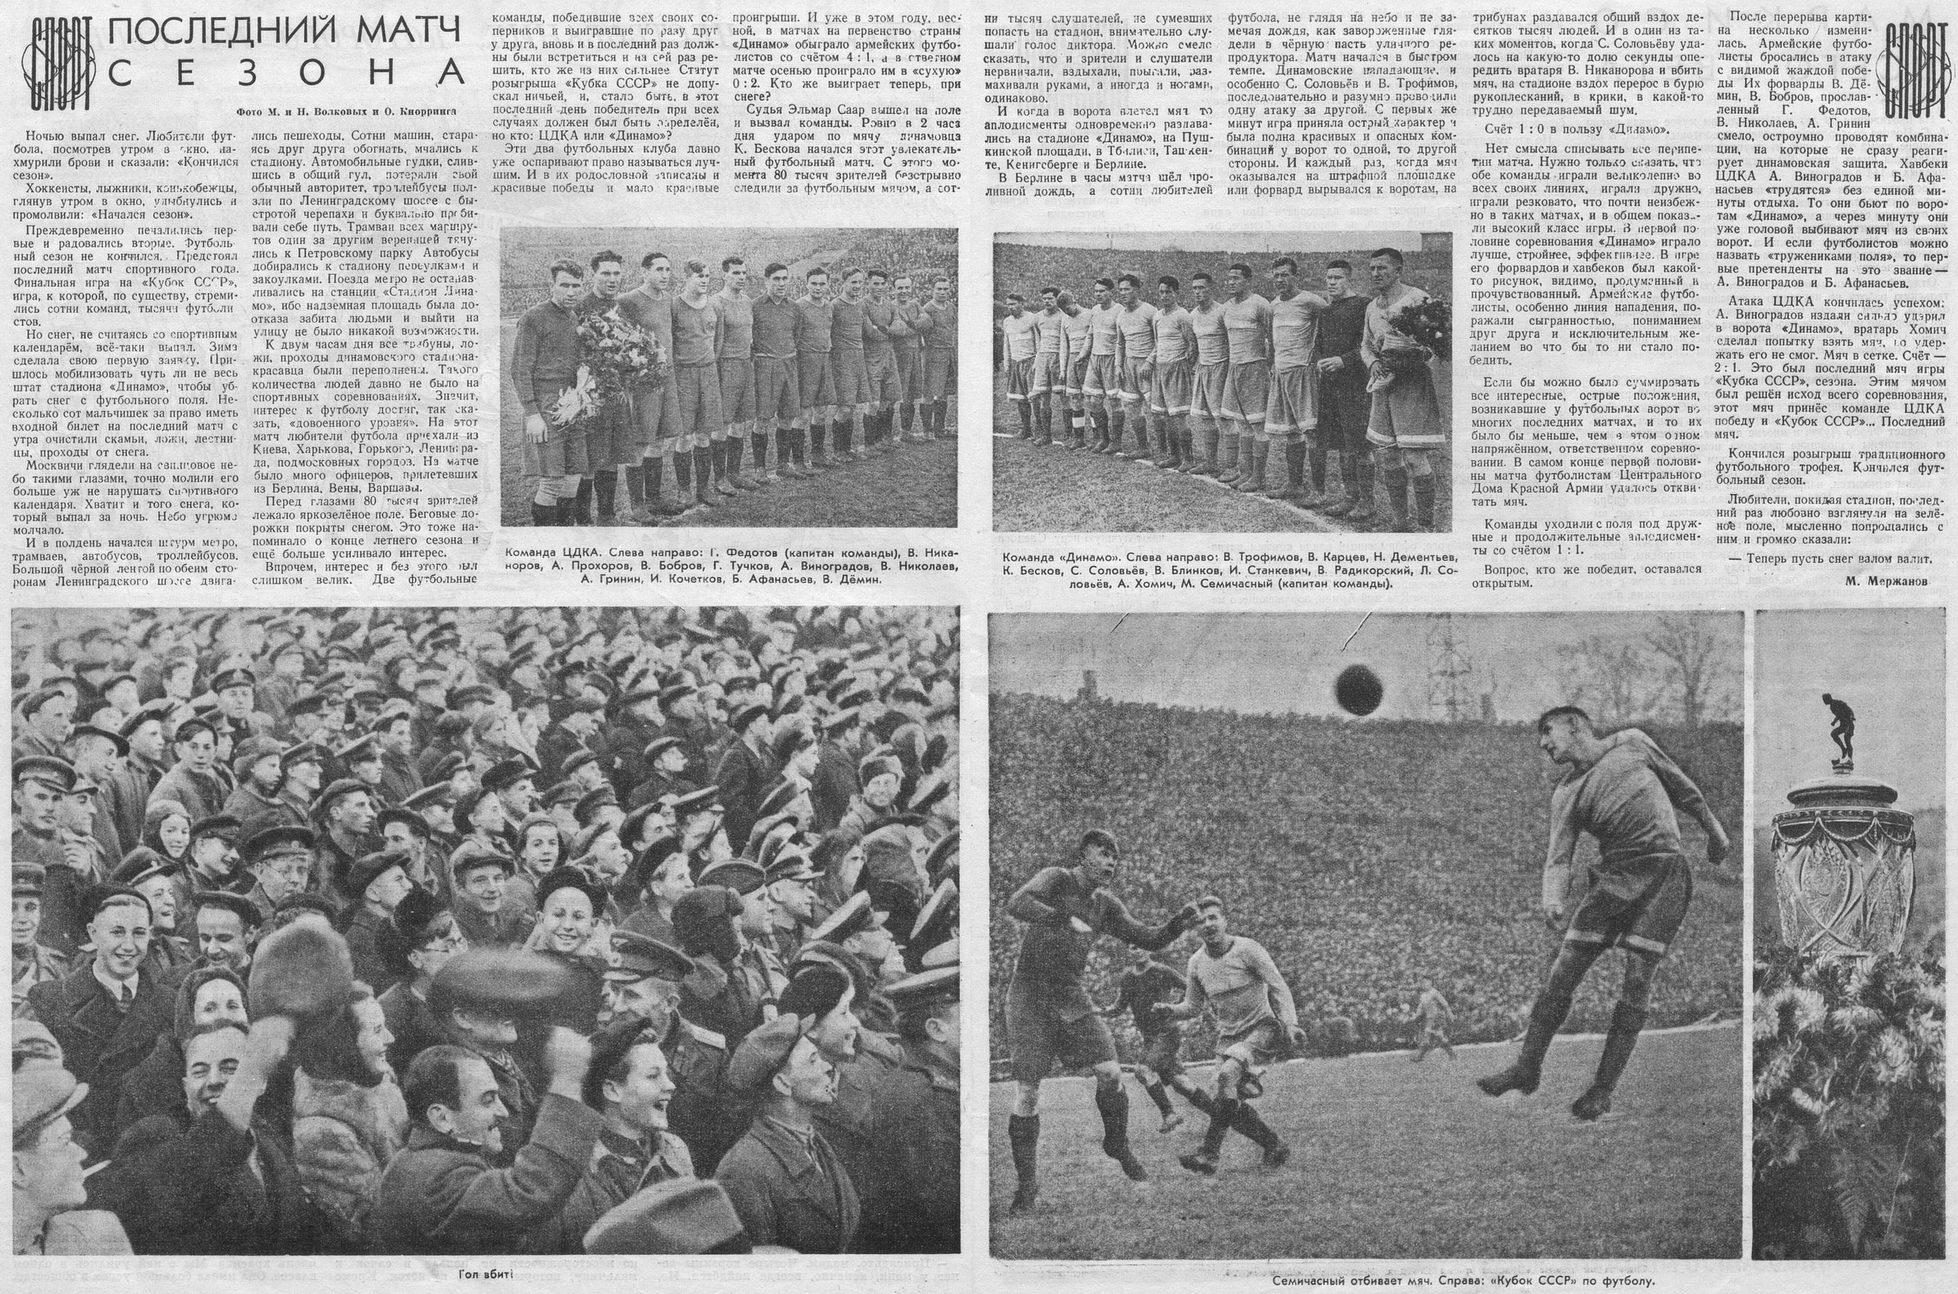 1945-10-14.CDKA-DinamoM.15.jpg